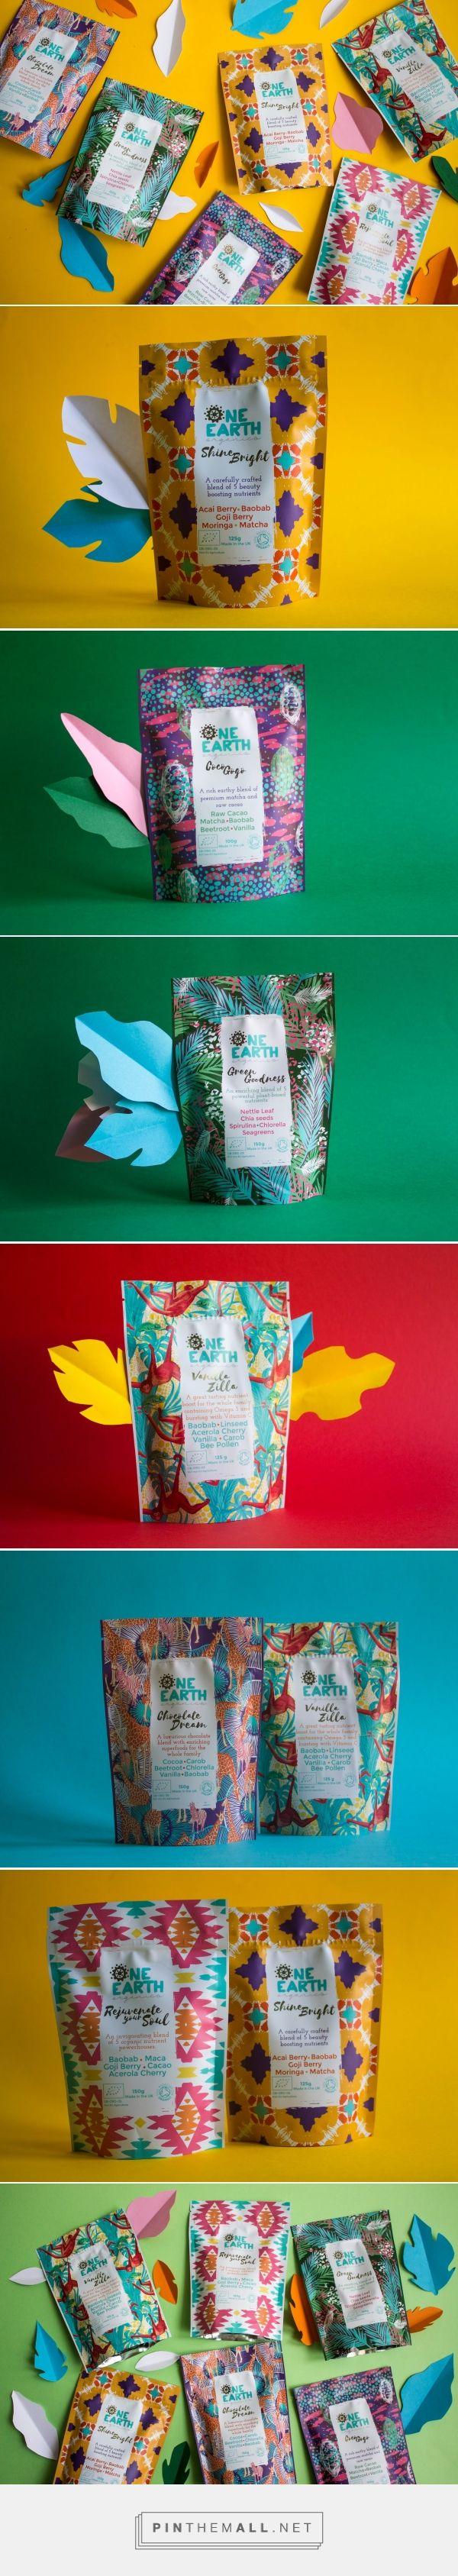 One Earth Organics packaging design by MoKalache.Design - http://www.packagingoftheworld.com/2017/03/one-earth-organics.html